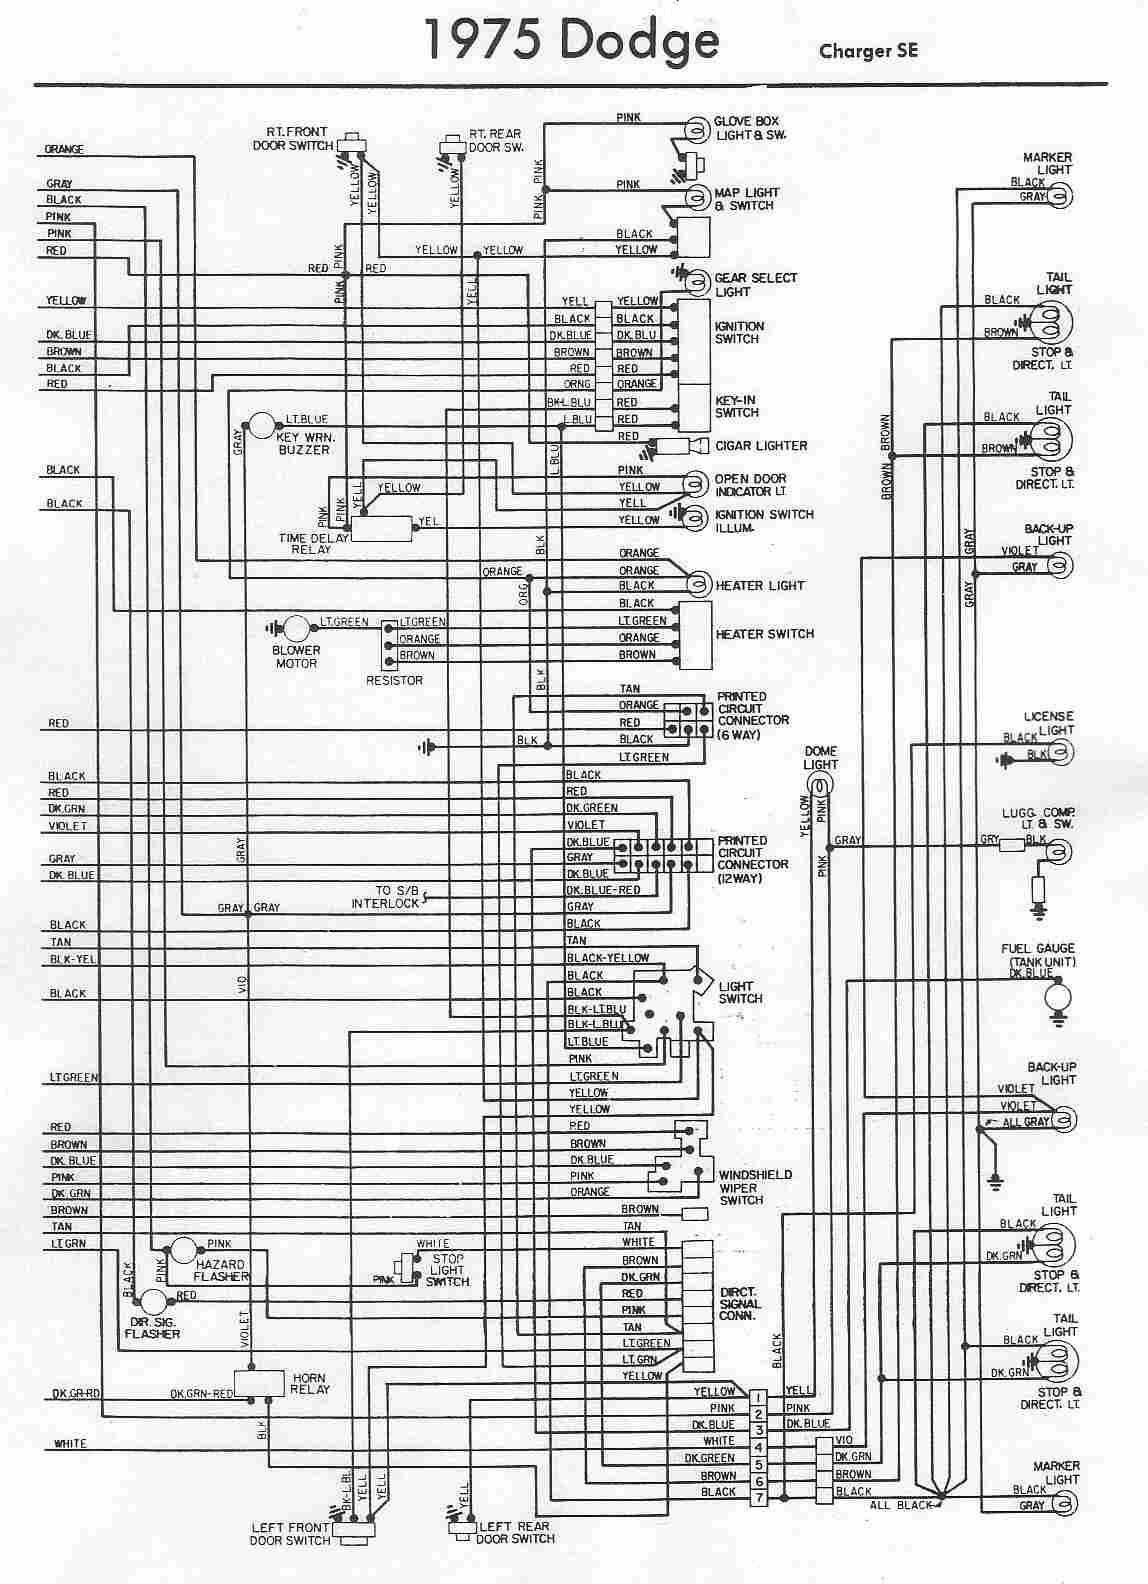 1975 dodge wiring diagram wiring diagram for you1975 dodge wiring diagram 4 [ 1148 x 1584 Pixel ]